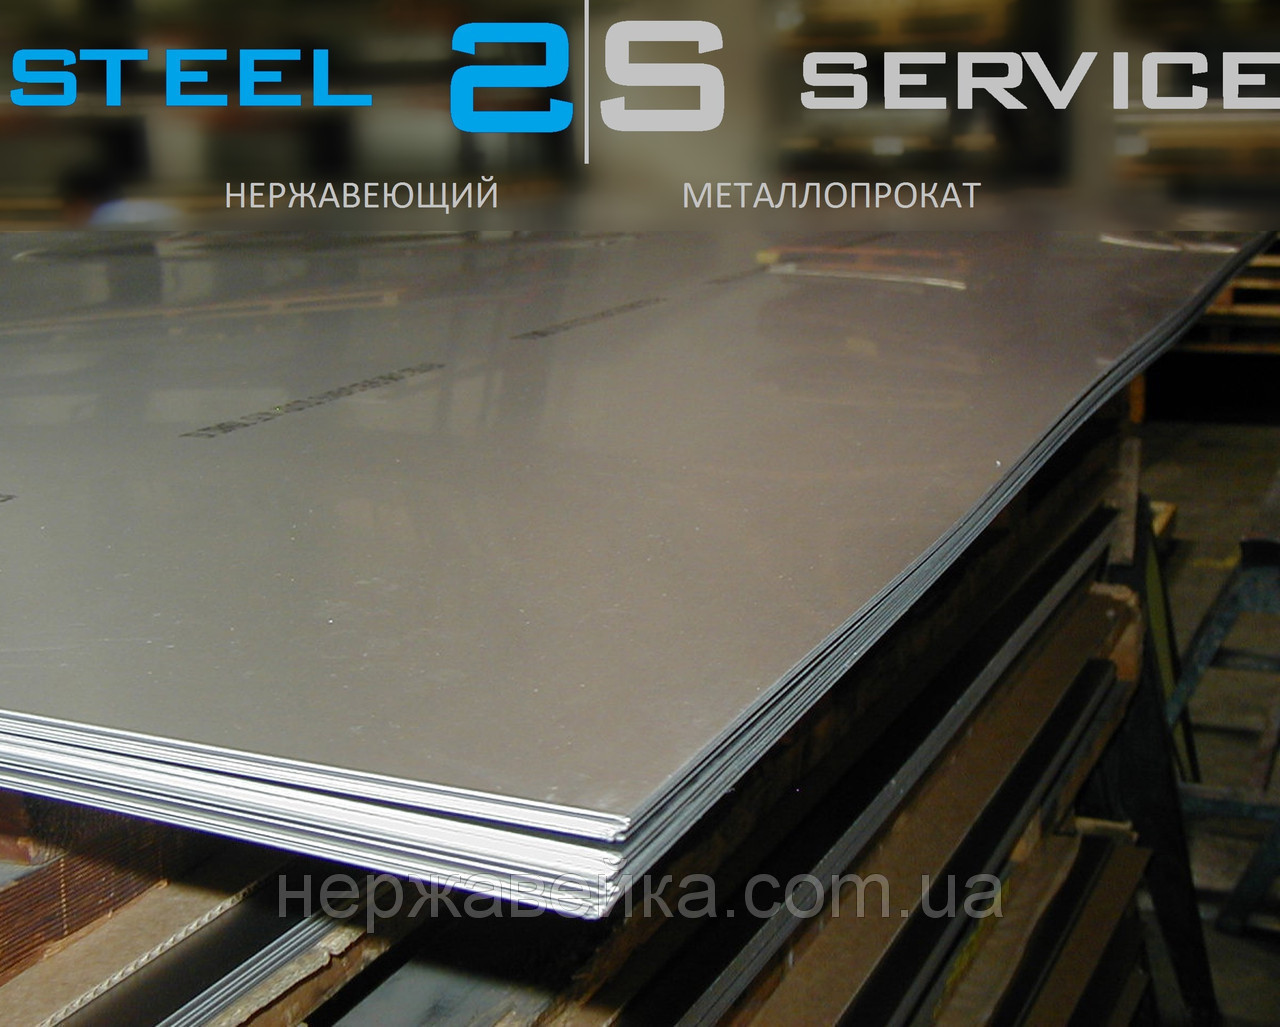 Нержавеющий лист 2х1250х2500мм  AISI 316Ti(10Х17Н13М2Т) 4N - шлифованный,  кислотостойкий